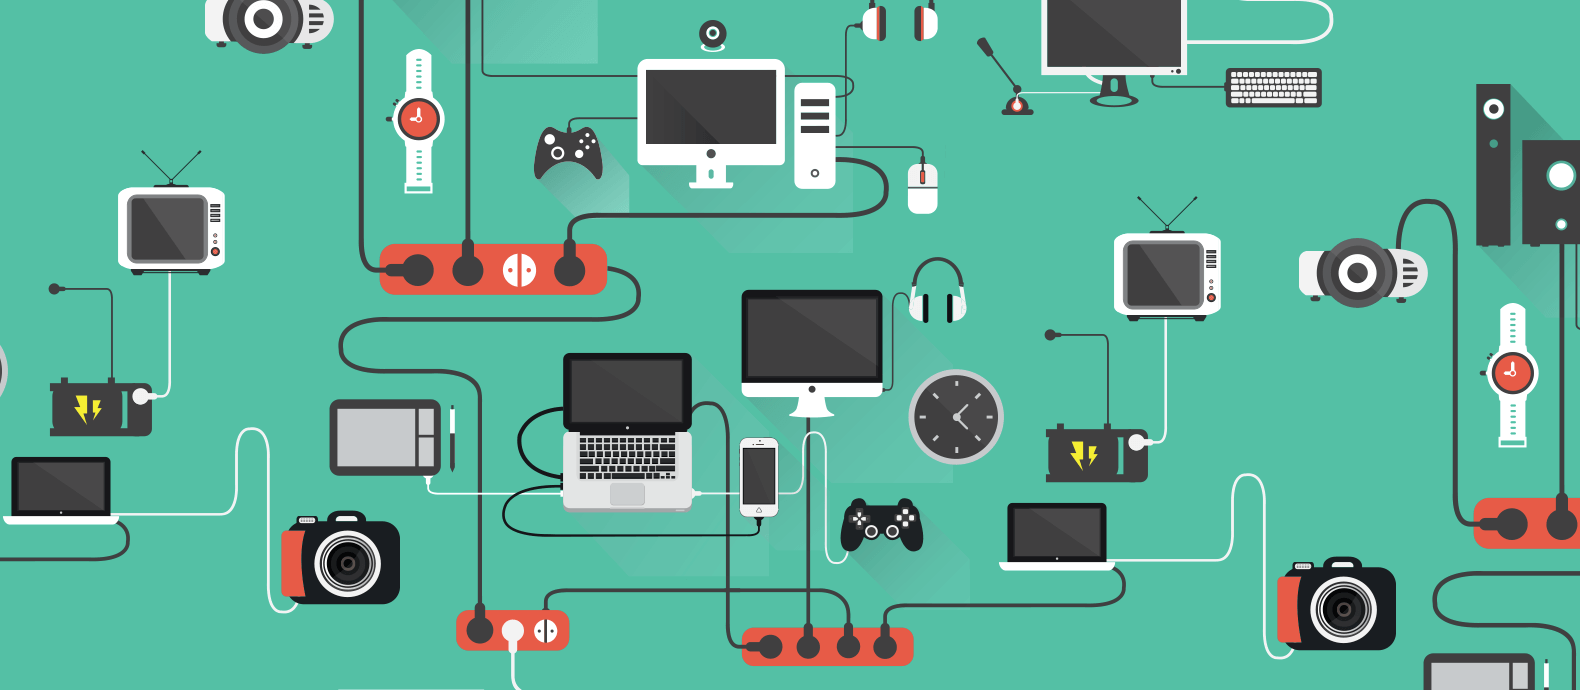 Online consumer electronics report